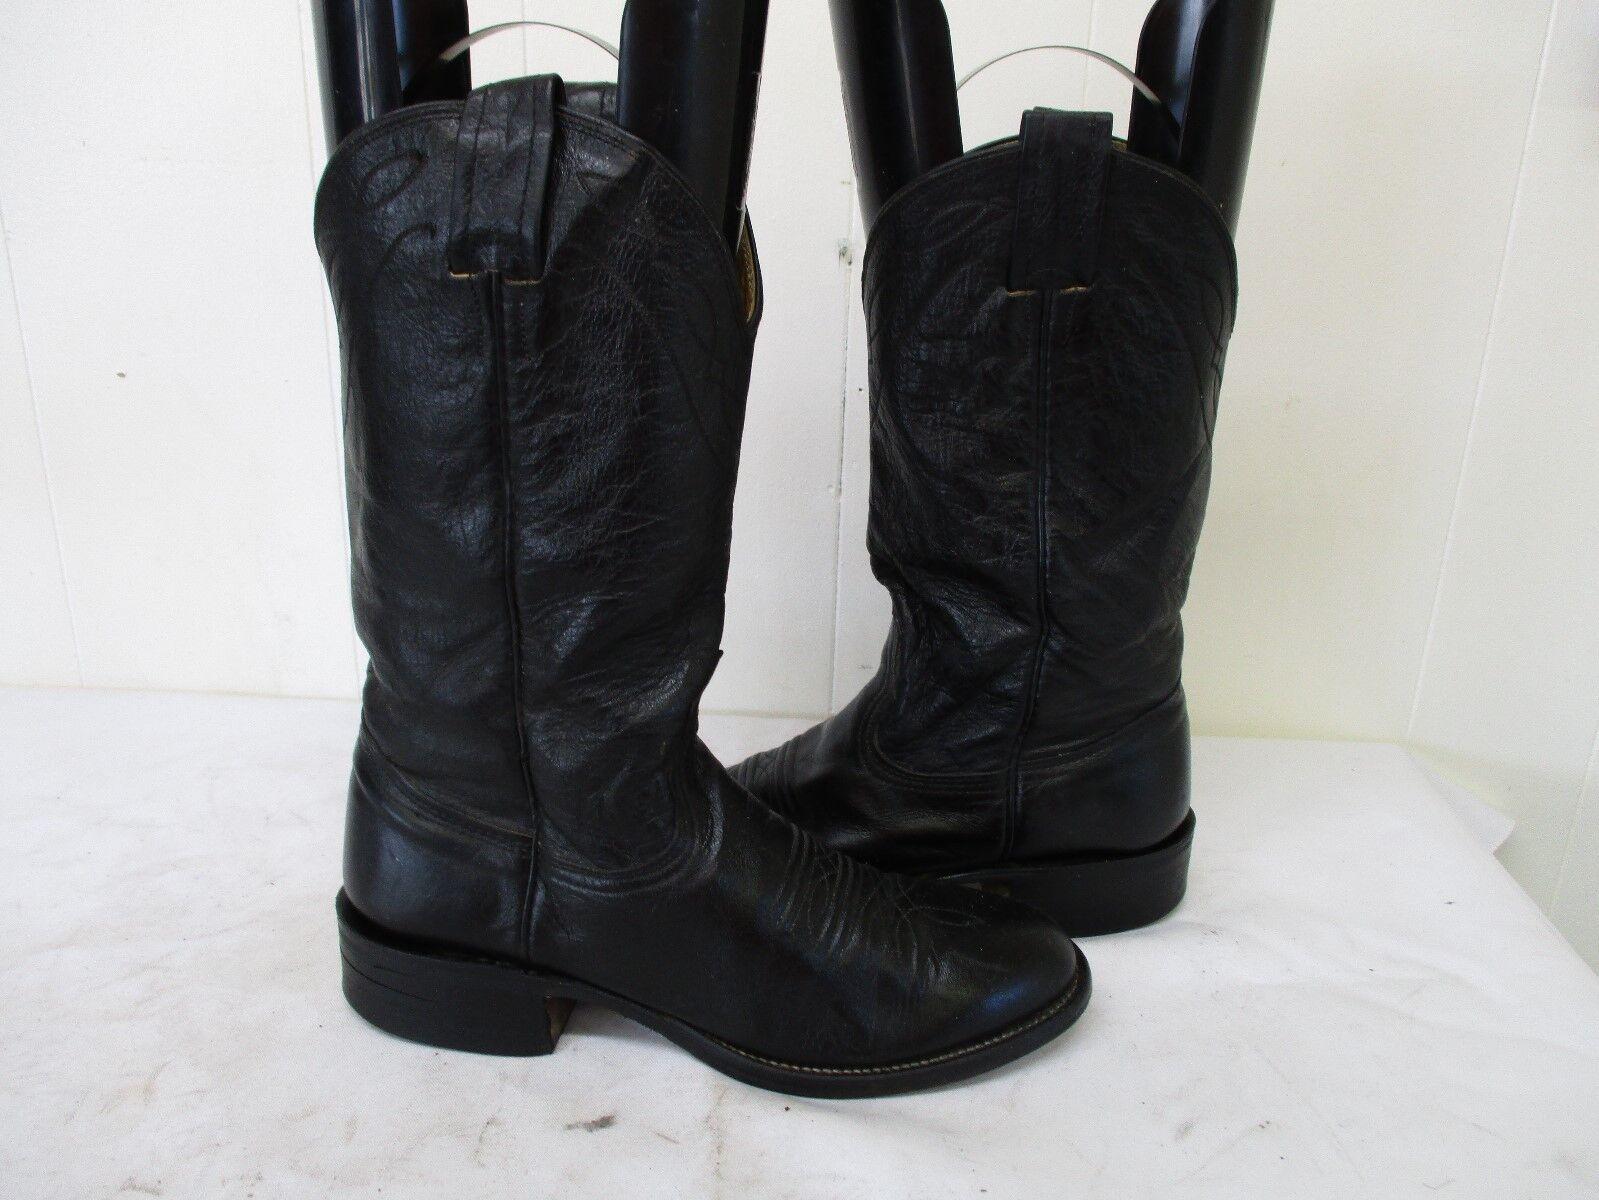 NOCONA Black Leather Cowboy Boots Womens Size 6 B Style 3001 USA